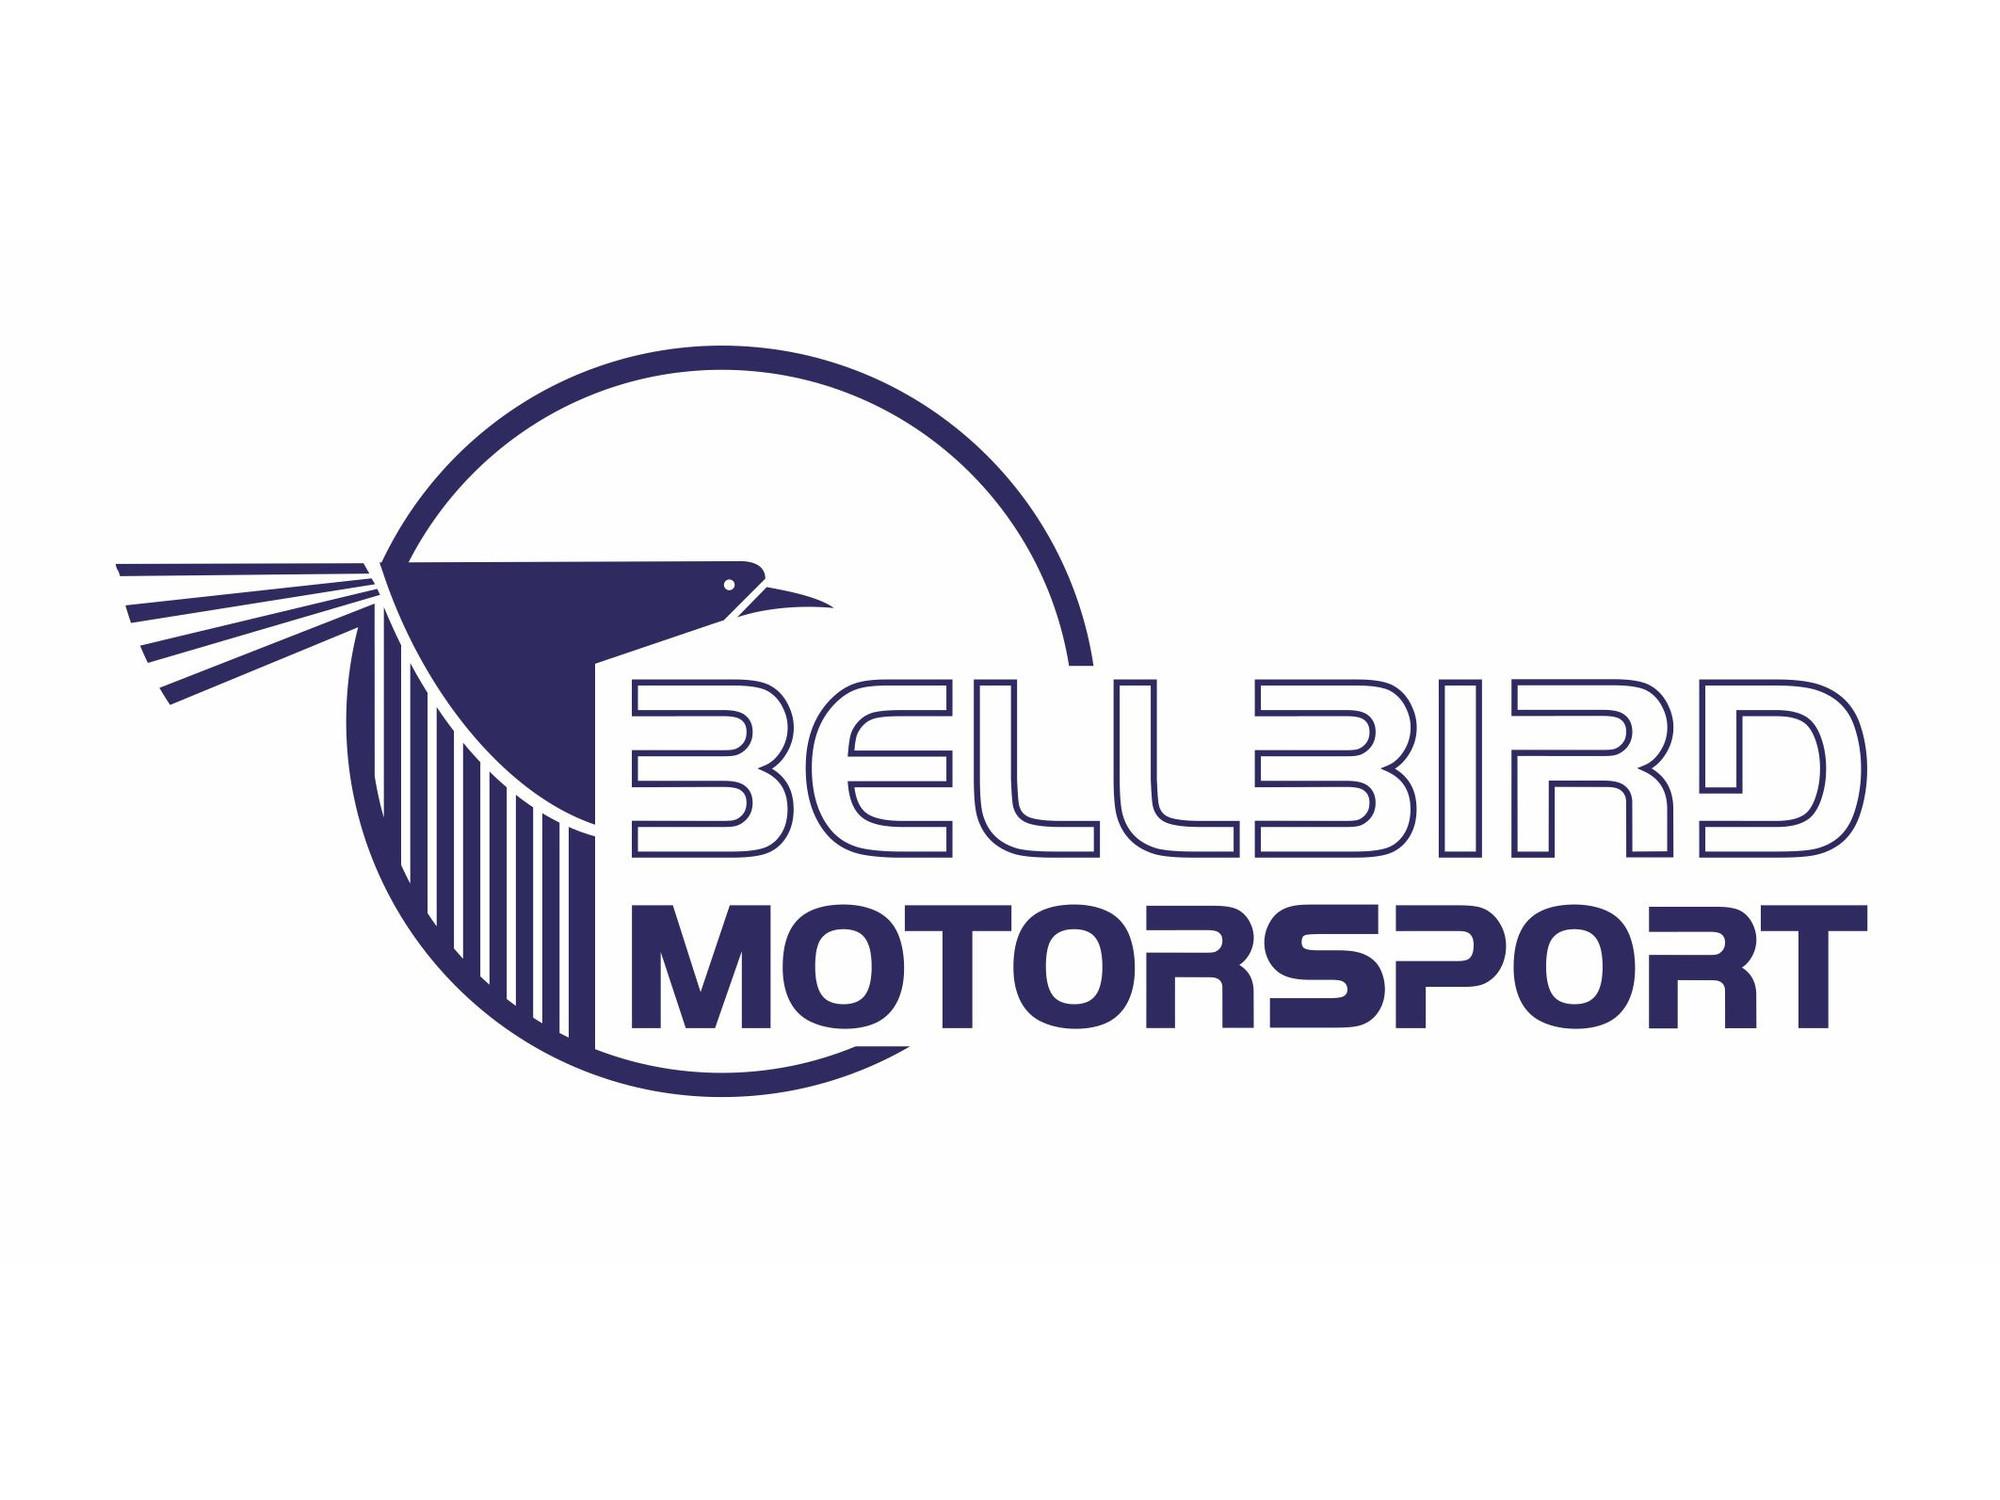 Bellbird Racing logo design by Signworks